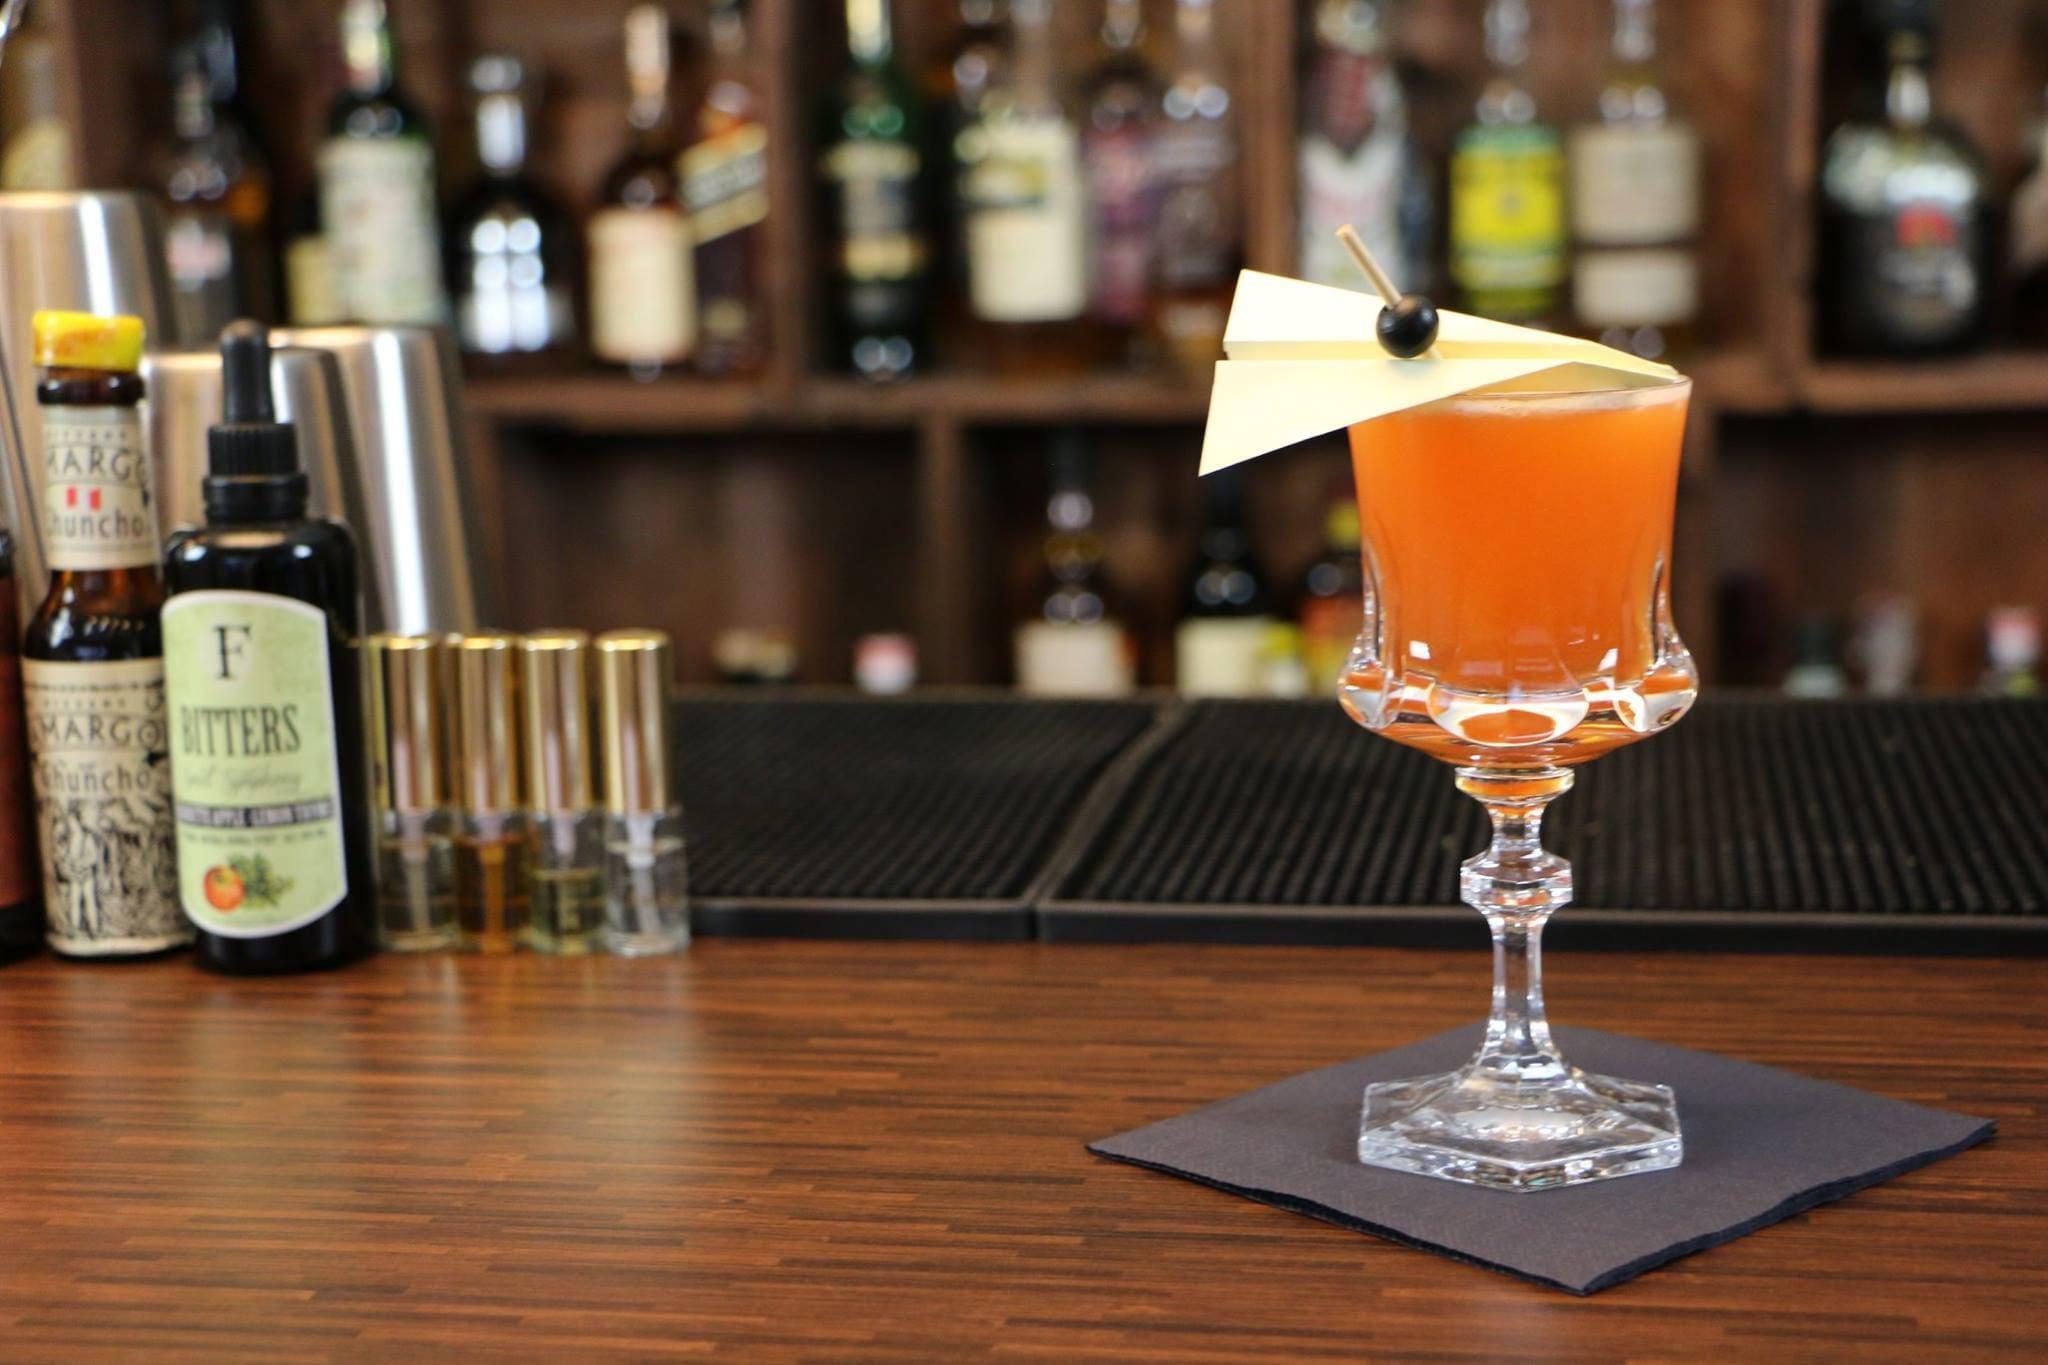 Großartig Longdrinks Klassiker Referenz Von 5 Tolle Bourbon Cocktails Für Den Herbst